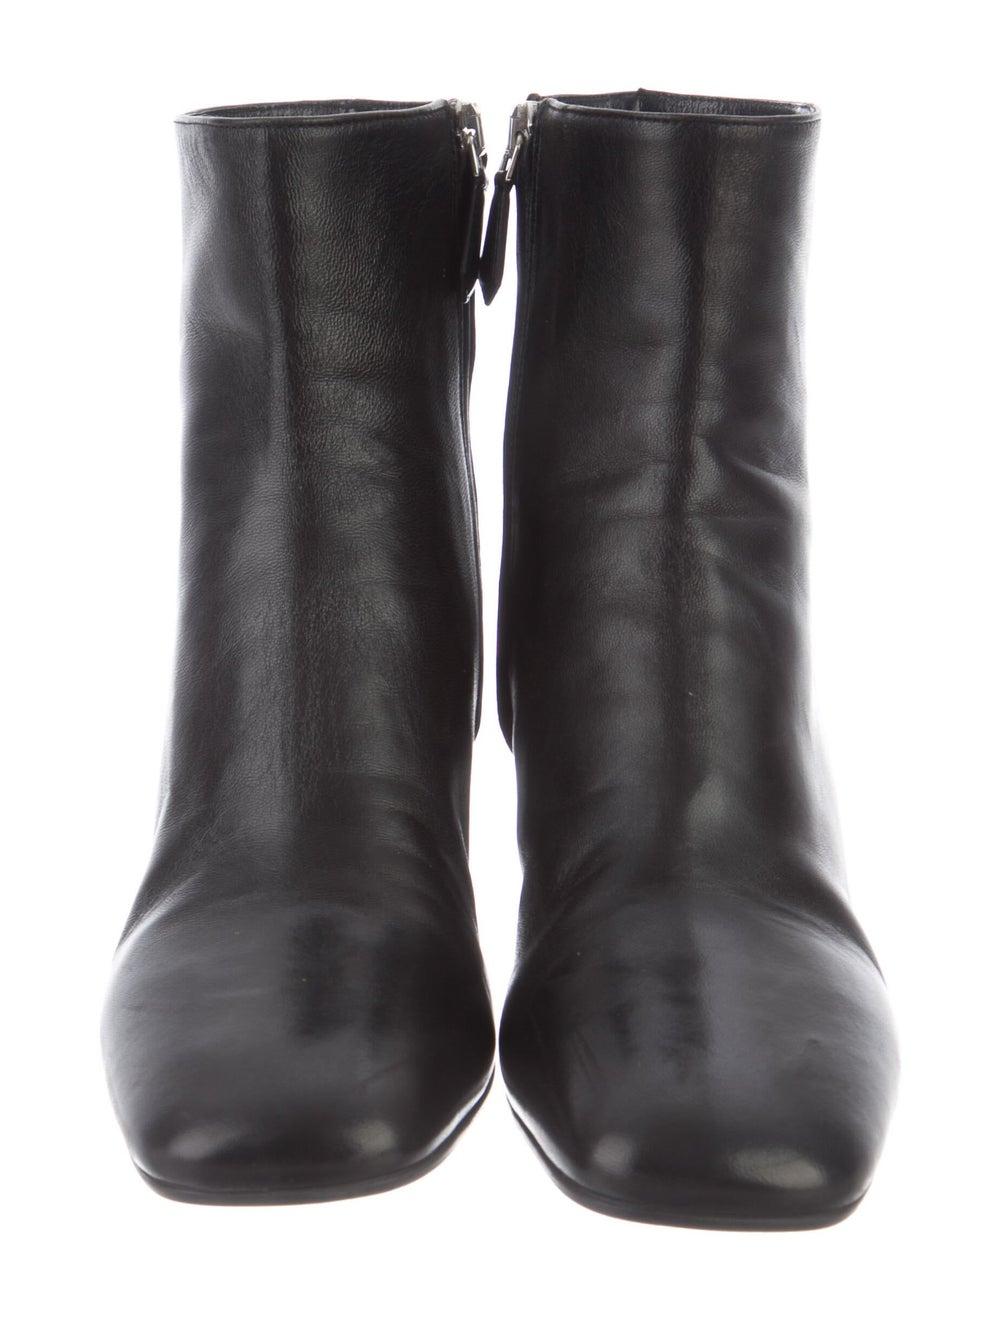 Prada Leather Boots Black - image 3